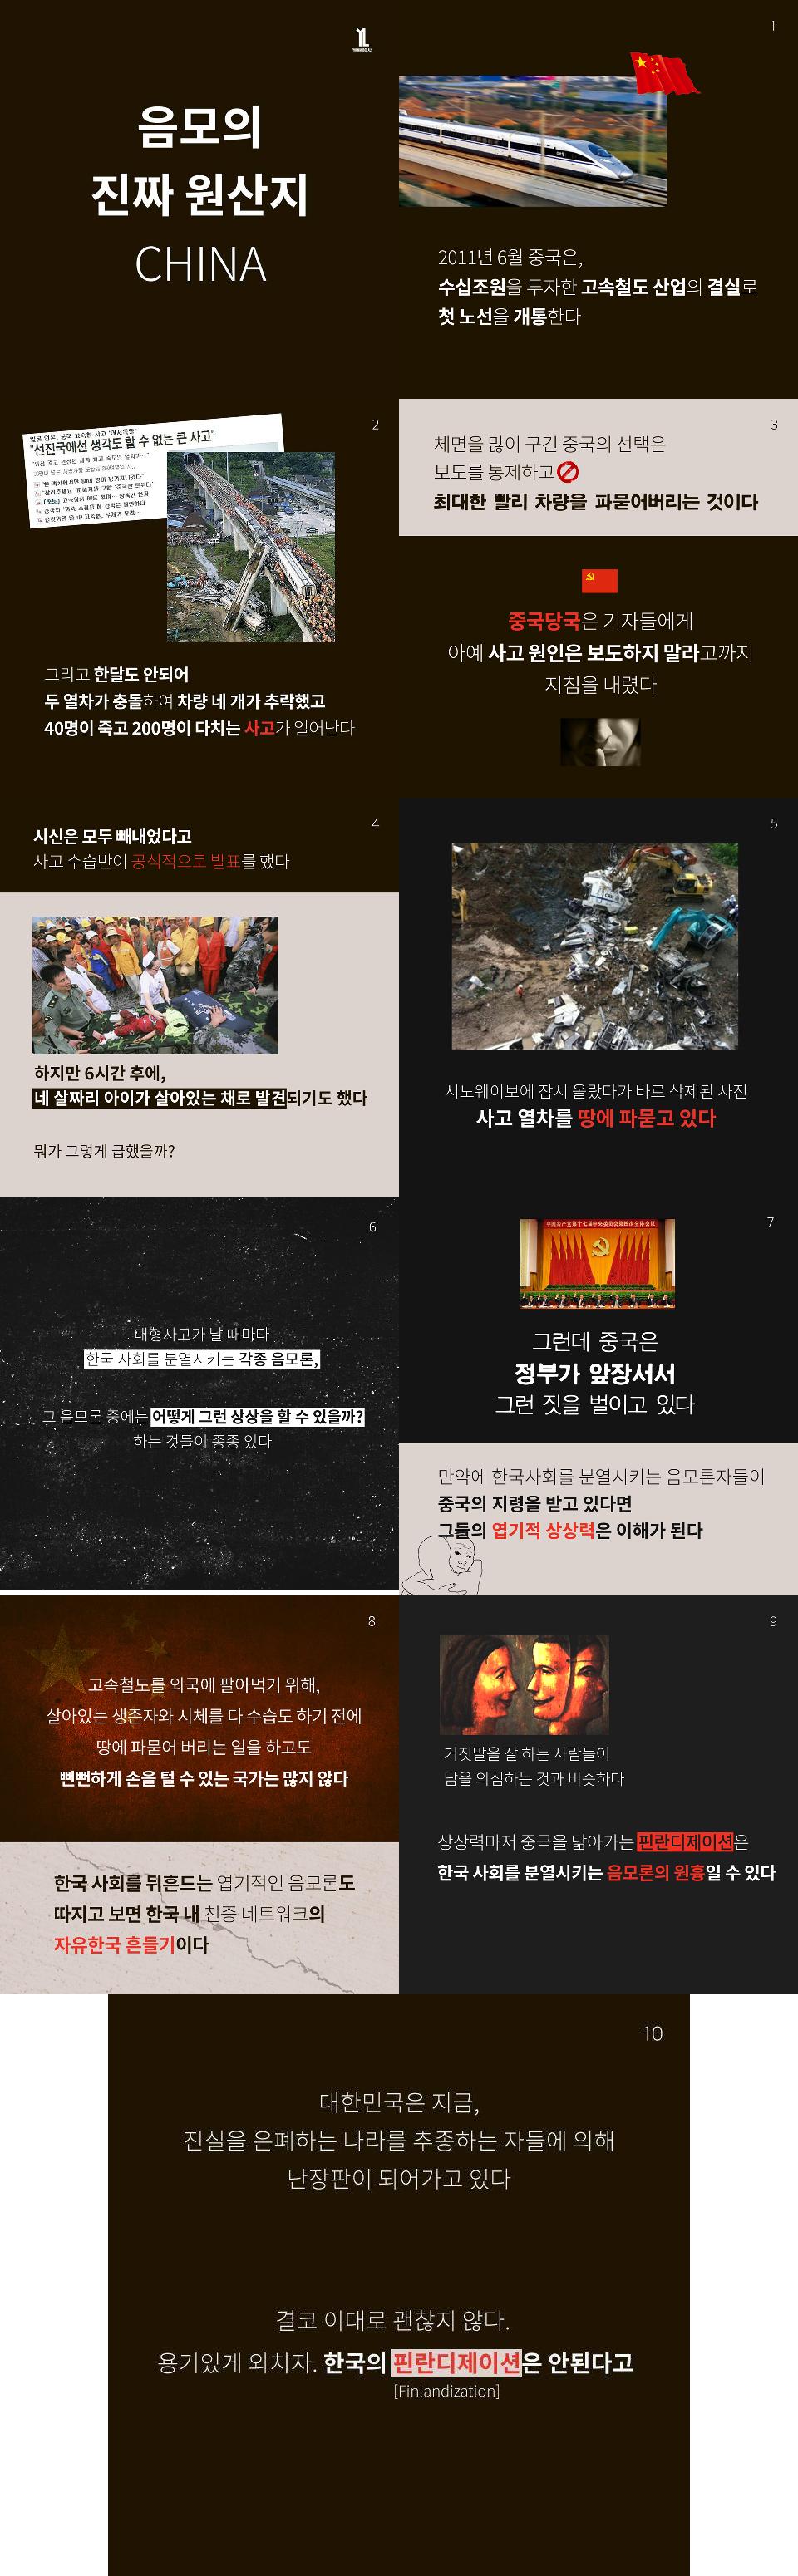 [YL] 34. 음모의 진짜 원산지, CHINA